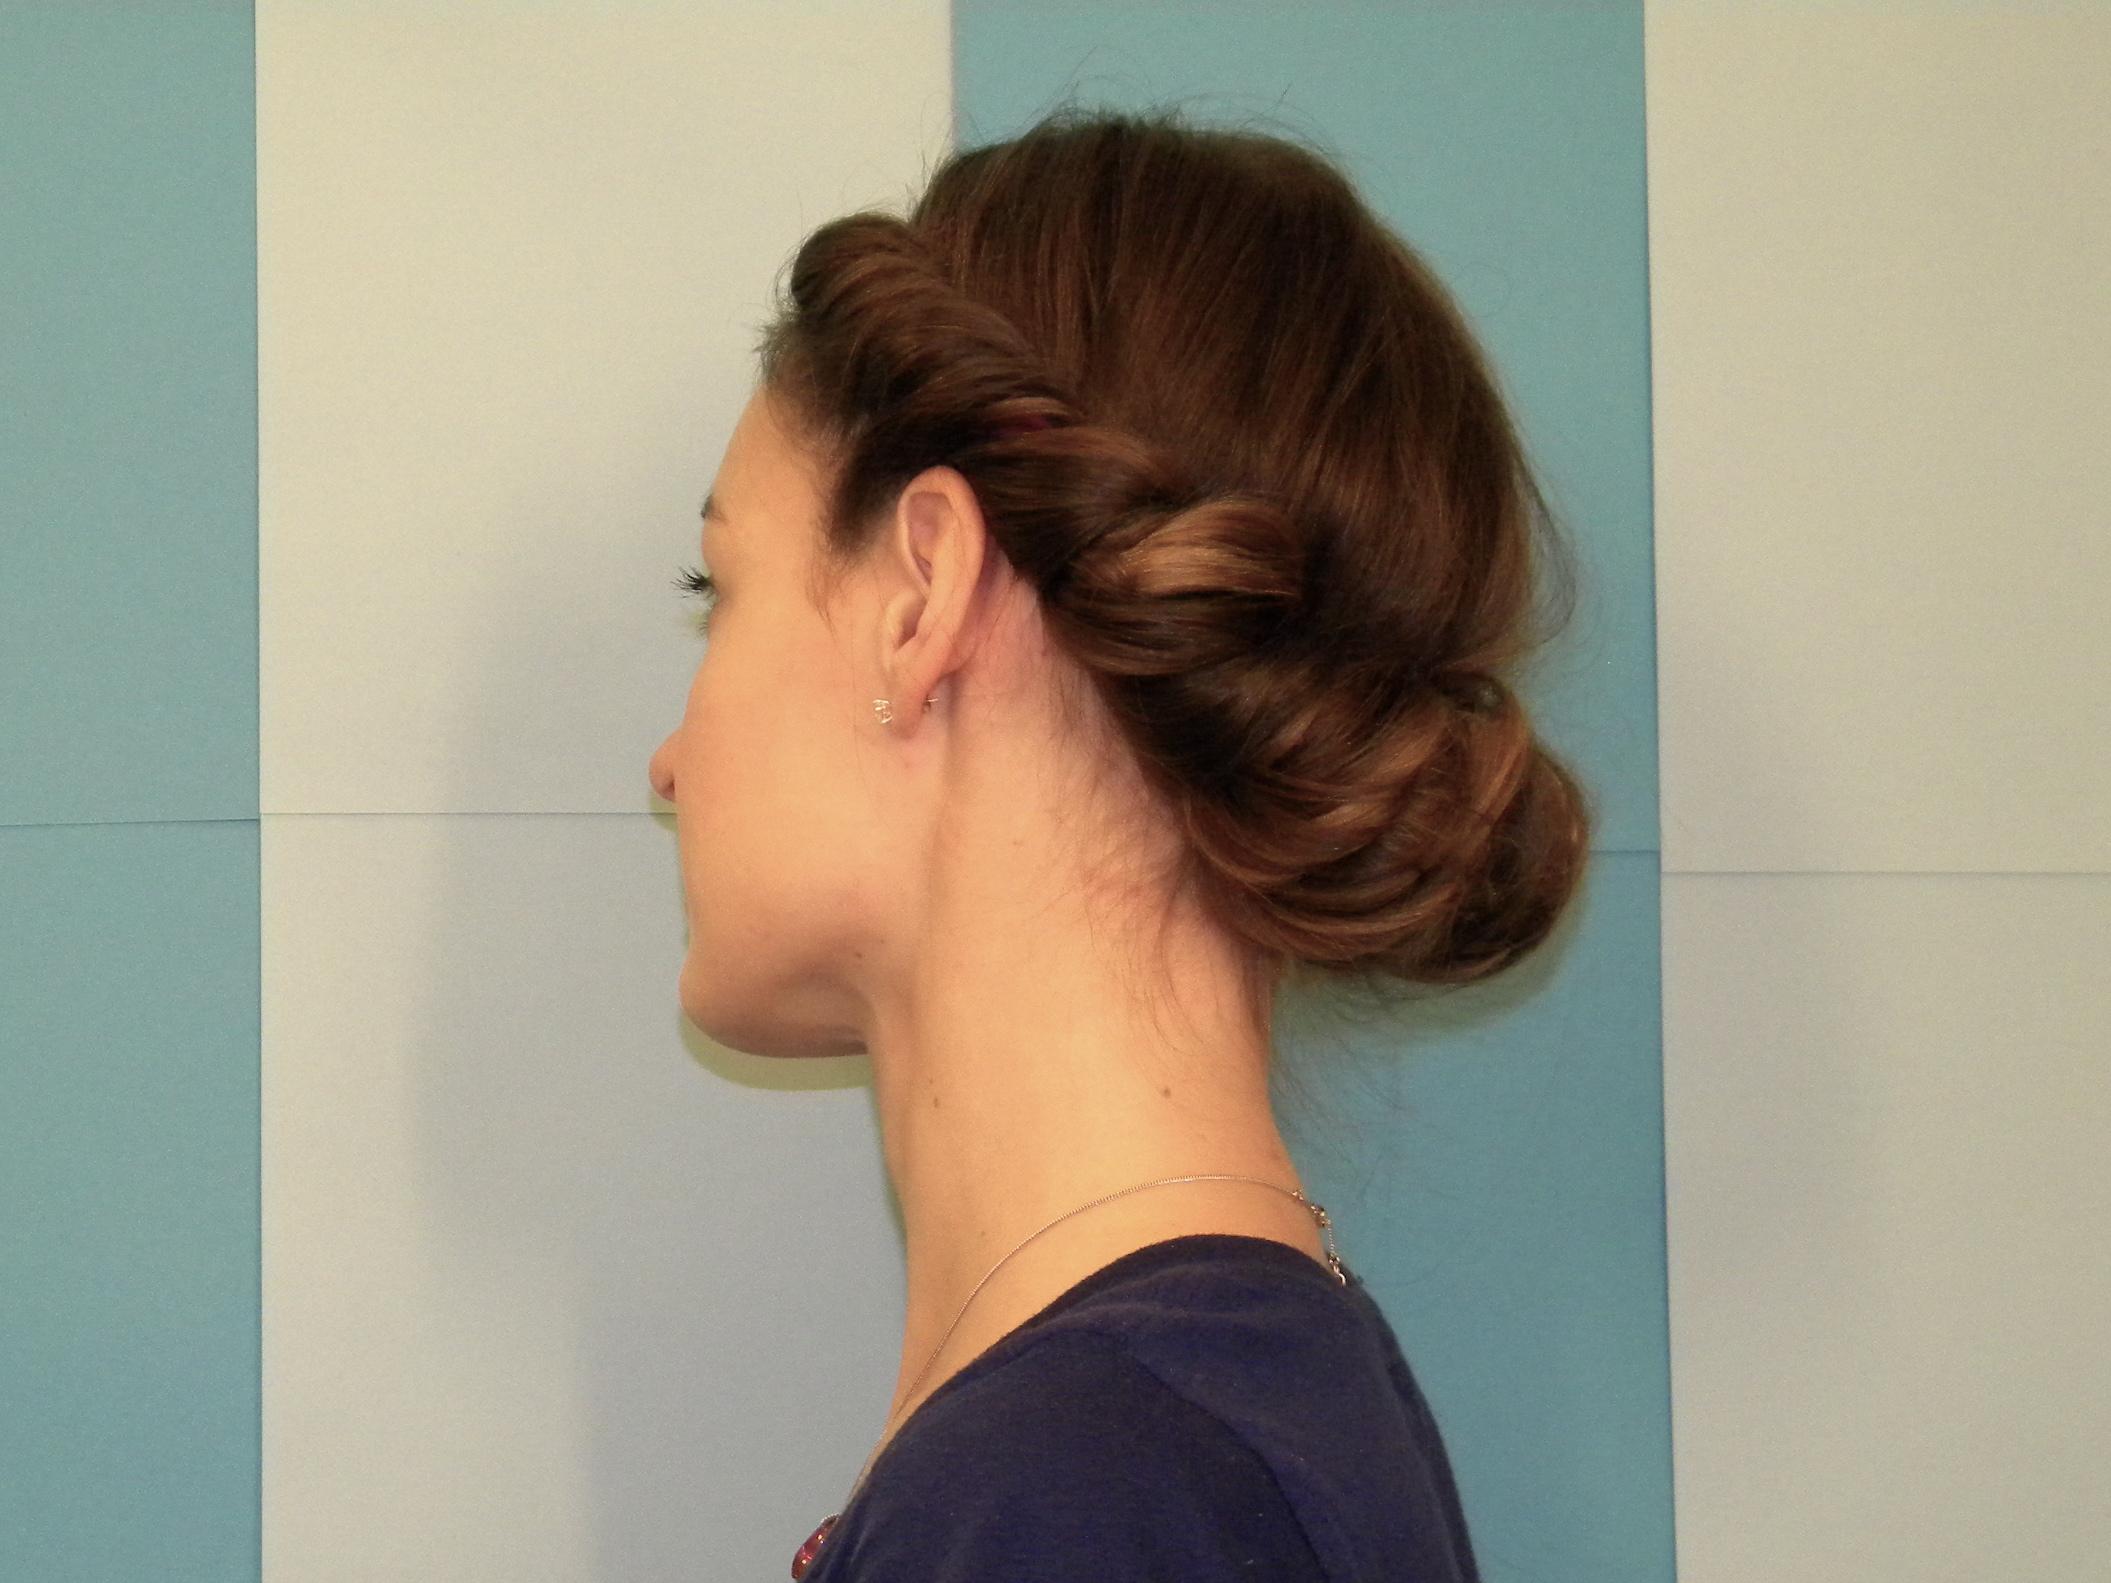 Hair tutorial: 5-minute overnight headband curls get your pretty on.